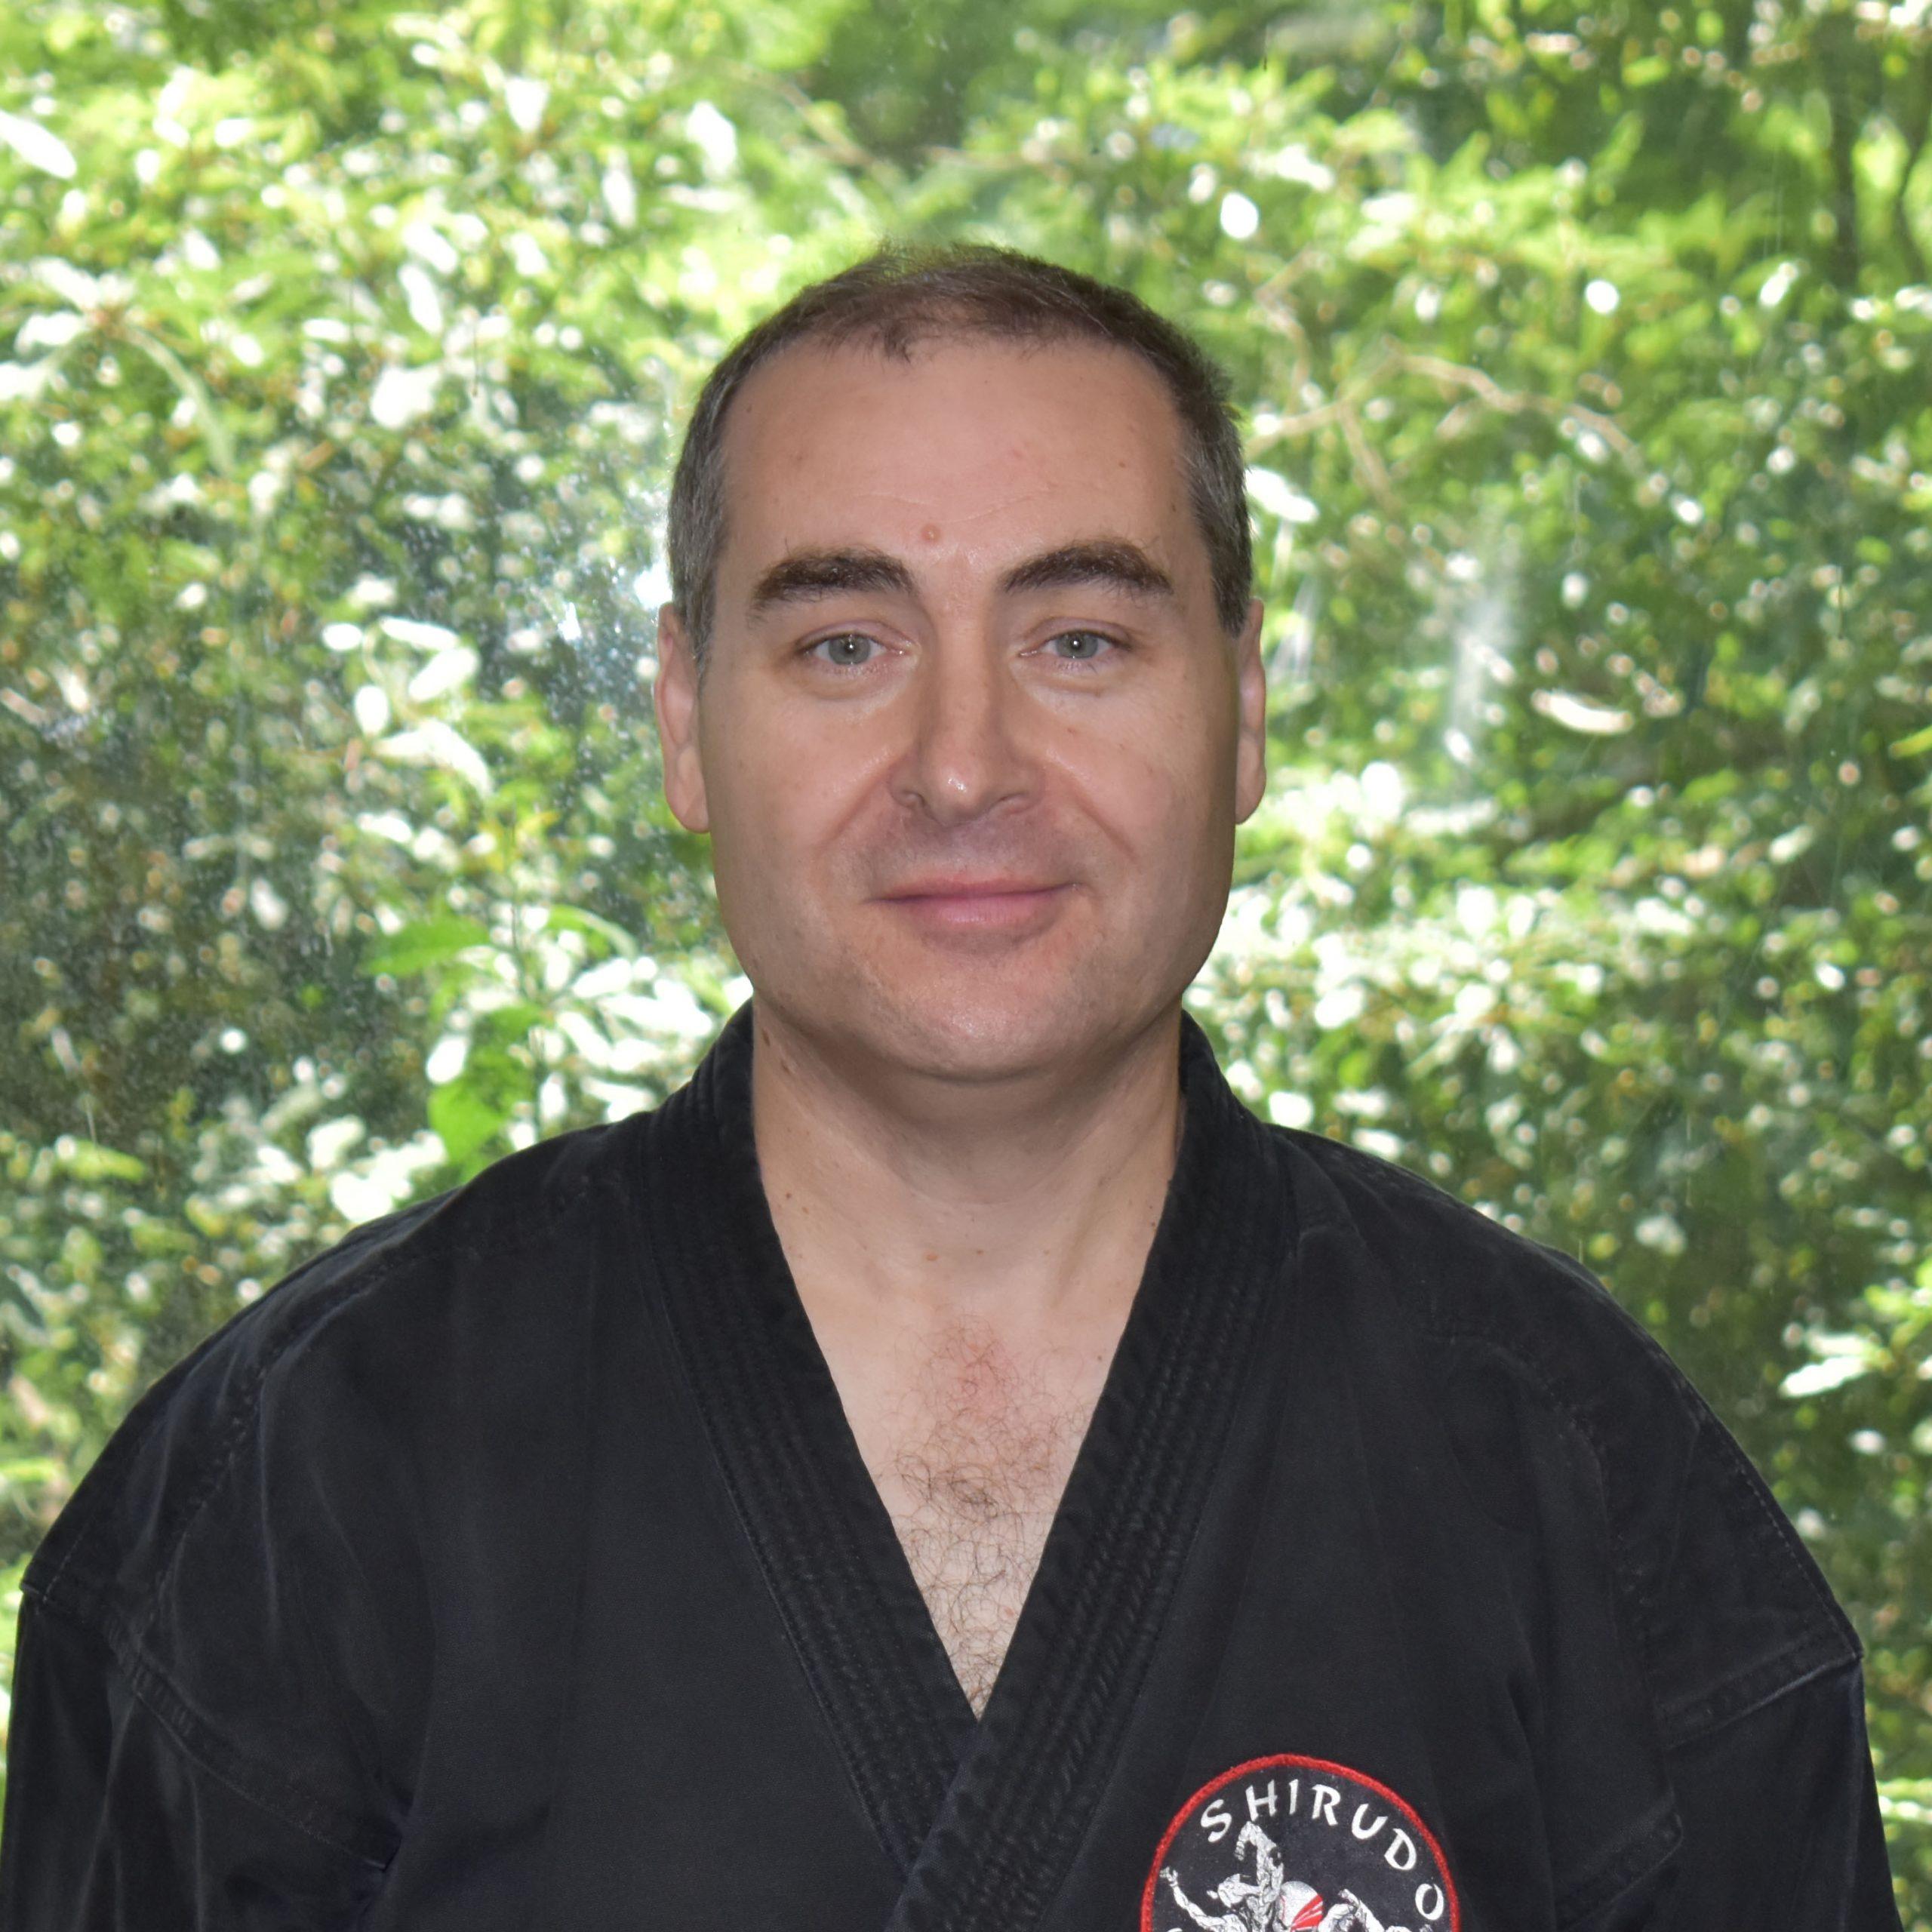 JOHN TOCHER SHIRUDO HYBRID CHIEF INSTRUCTOR